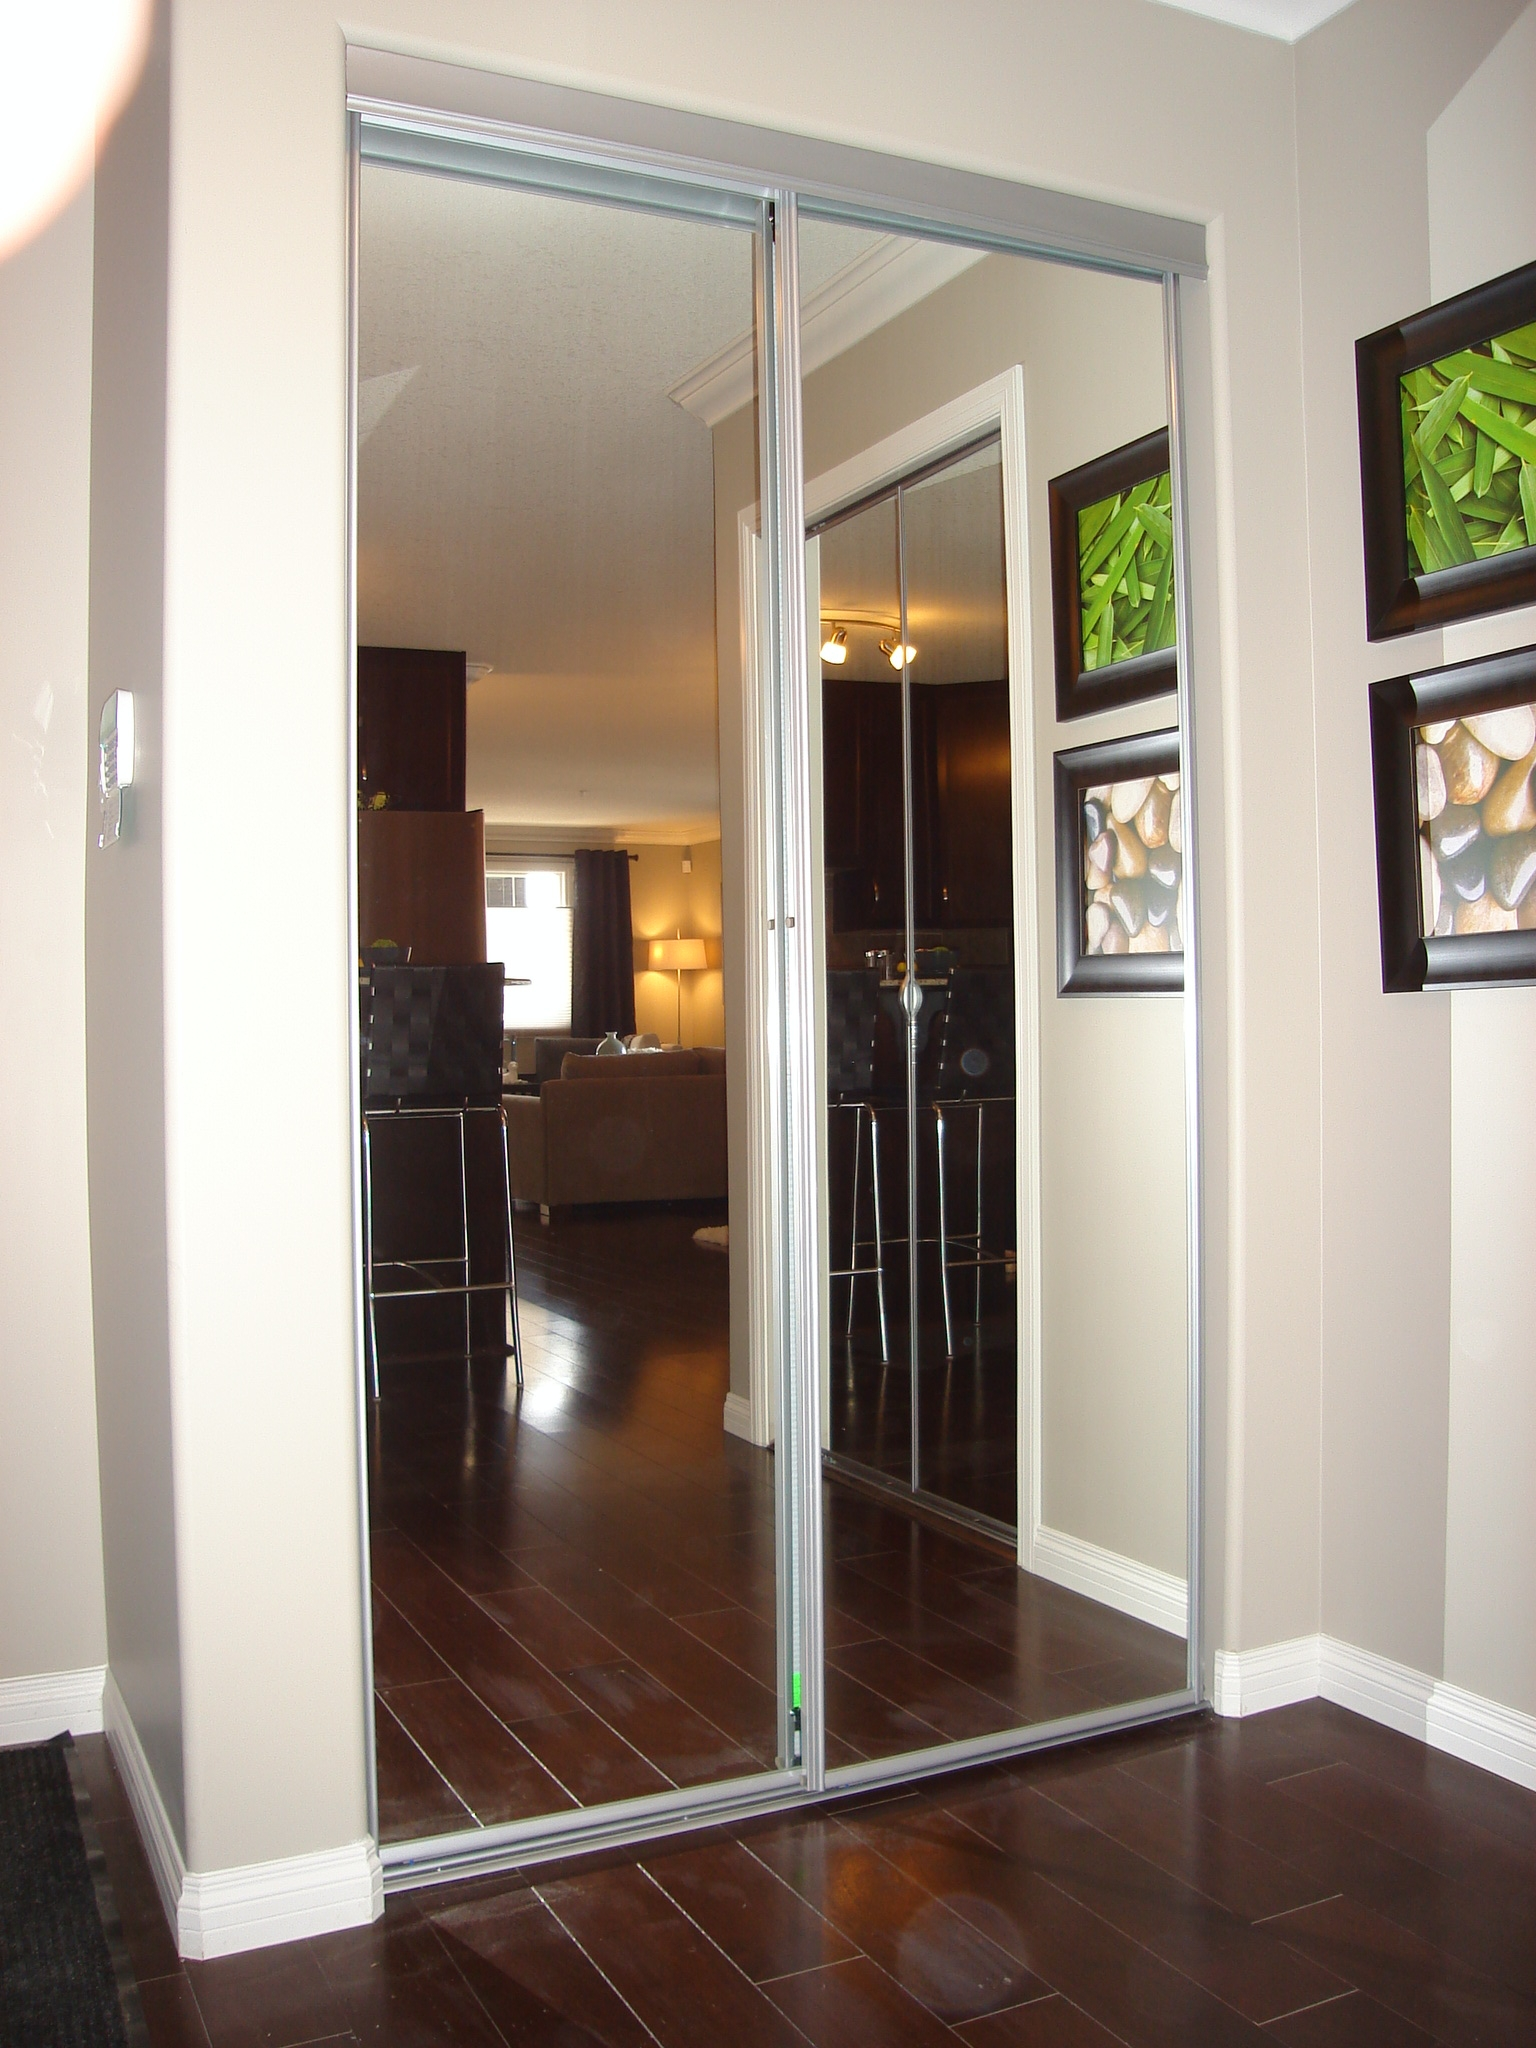 Stanley Mirrored Sliding Wardrobe Doors